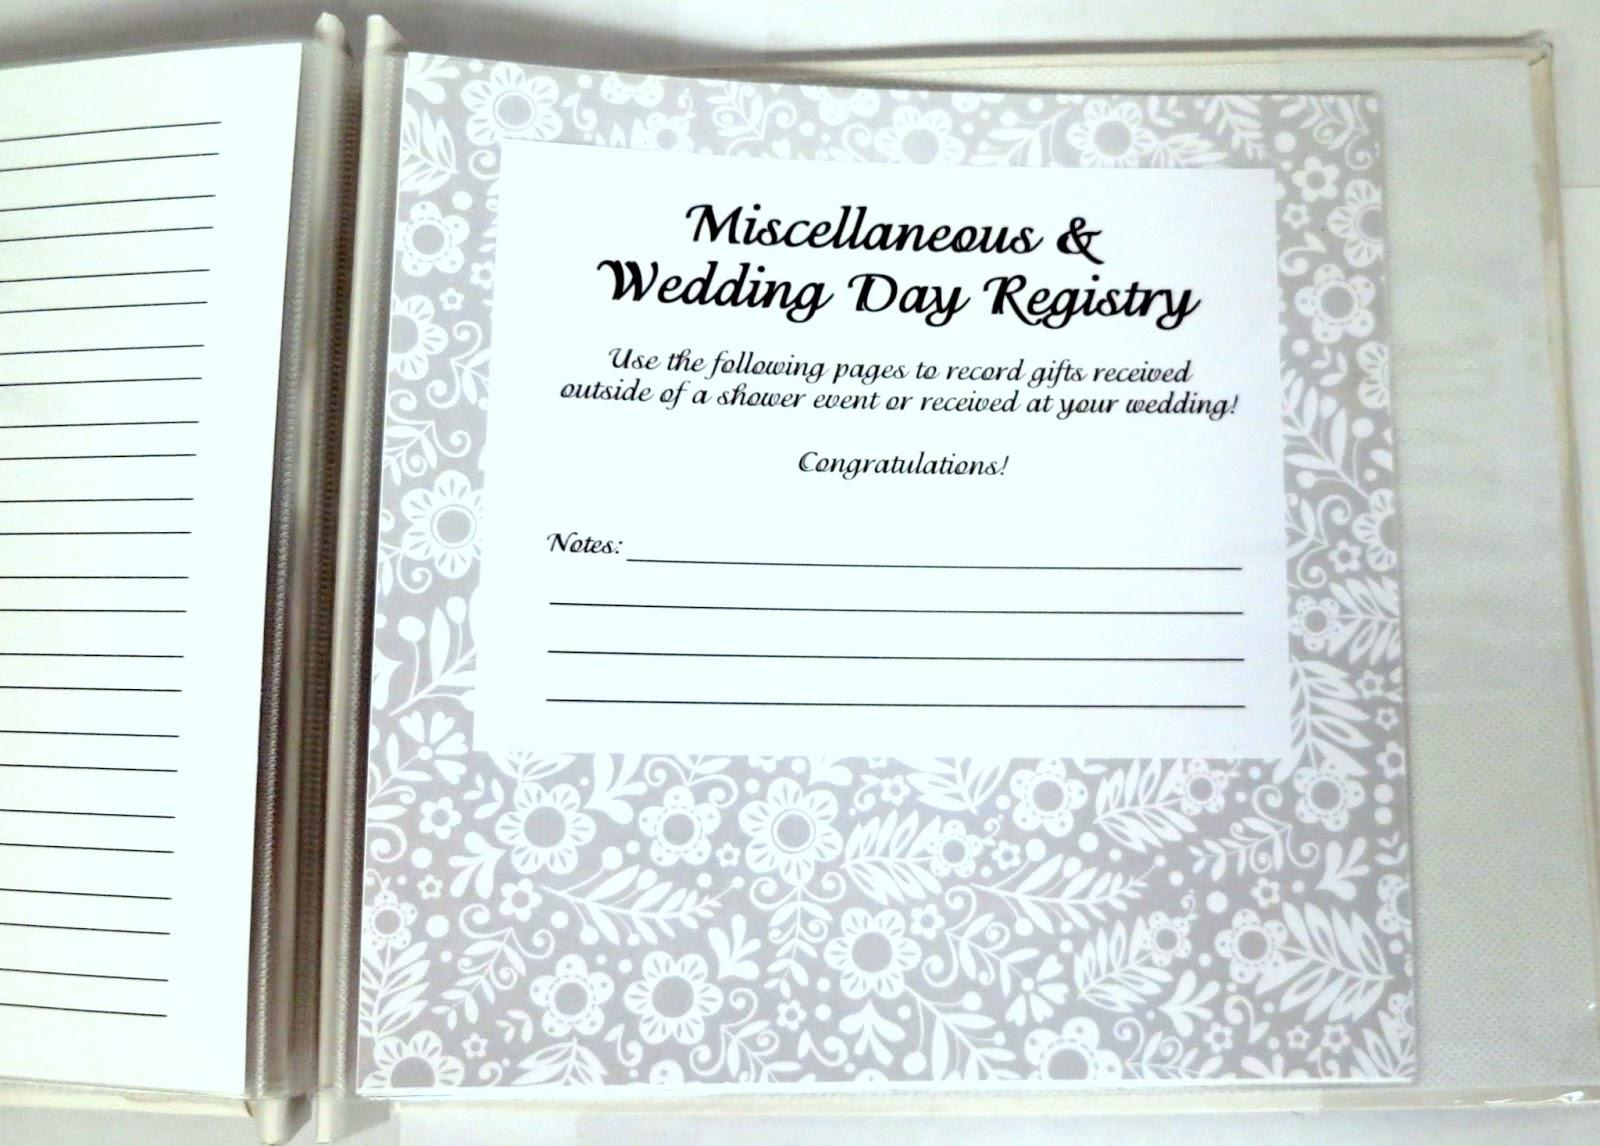 of bridal wedding for gift image ideas bathroom tar gifts registry target shower beautiful